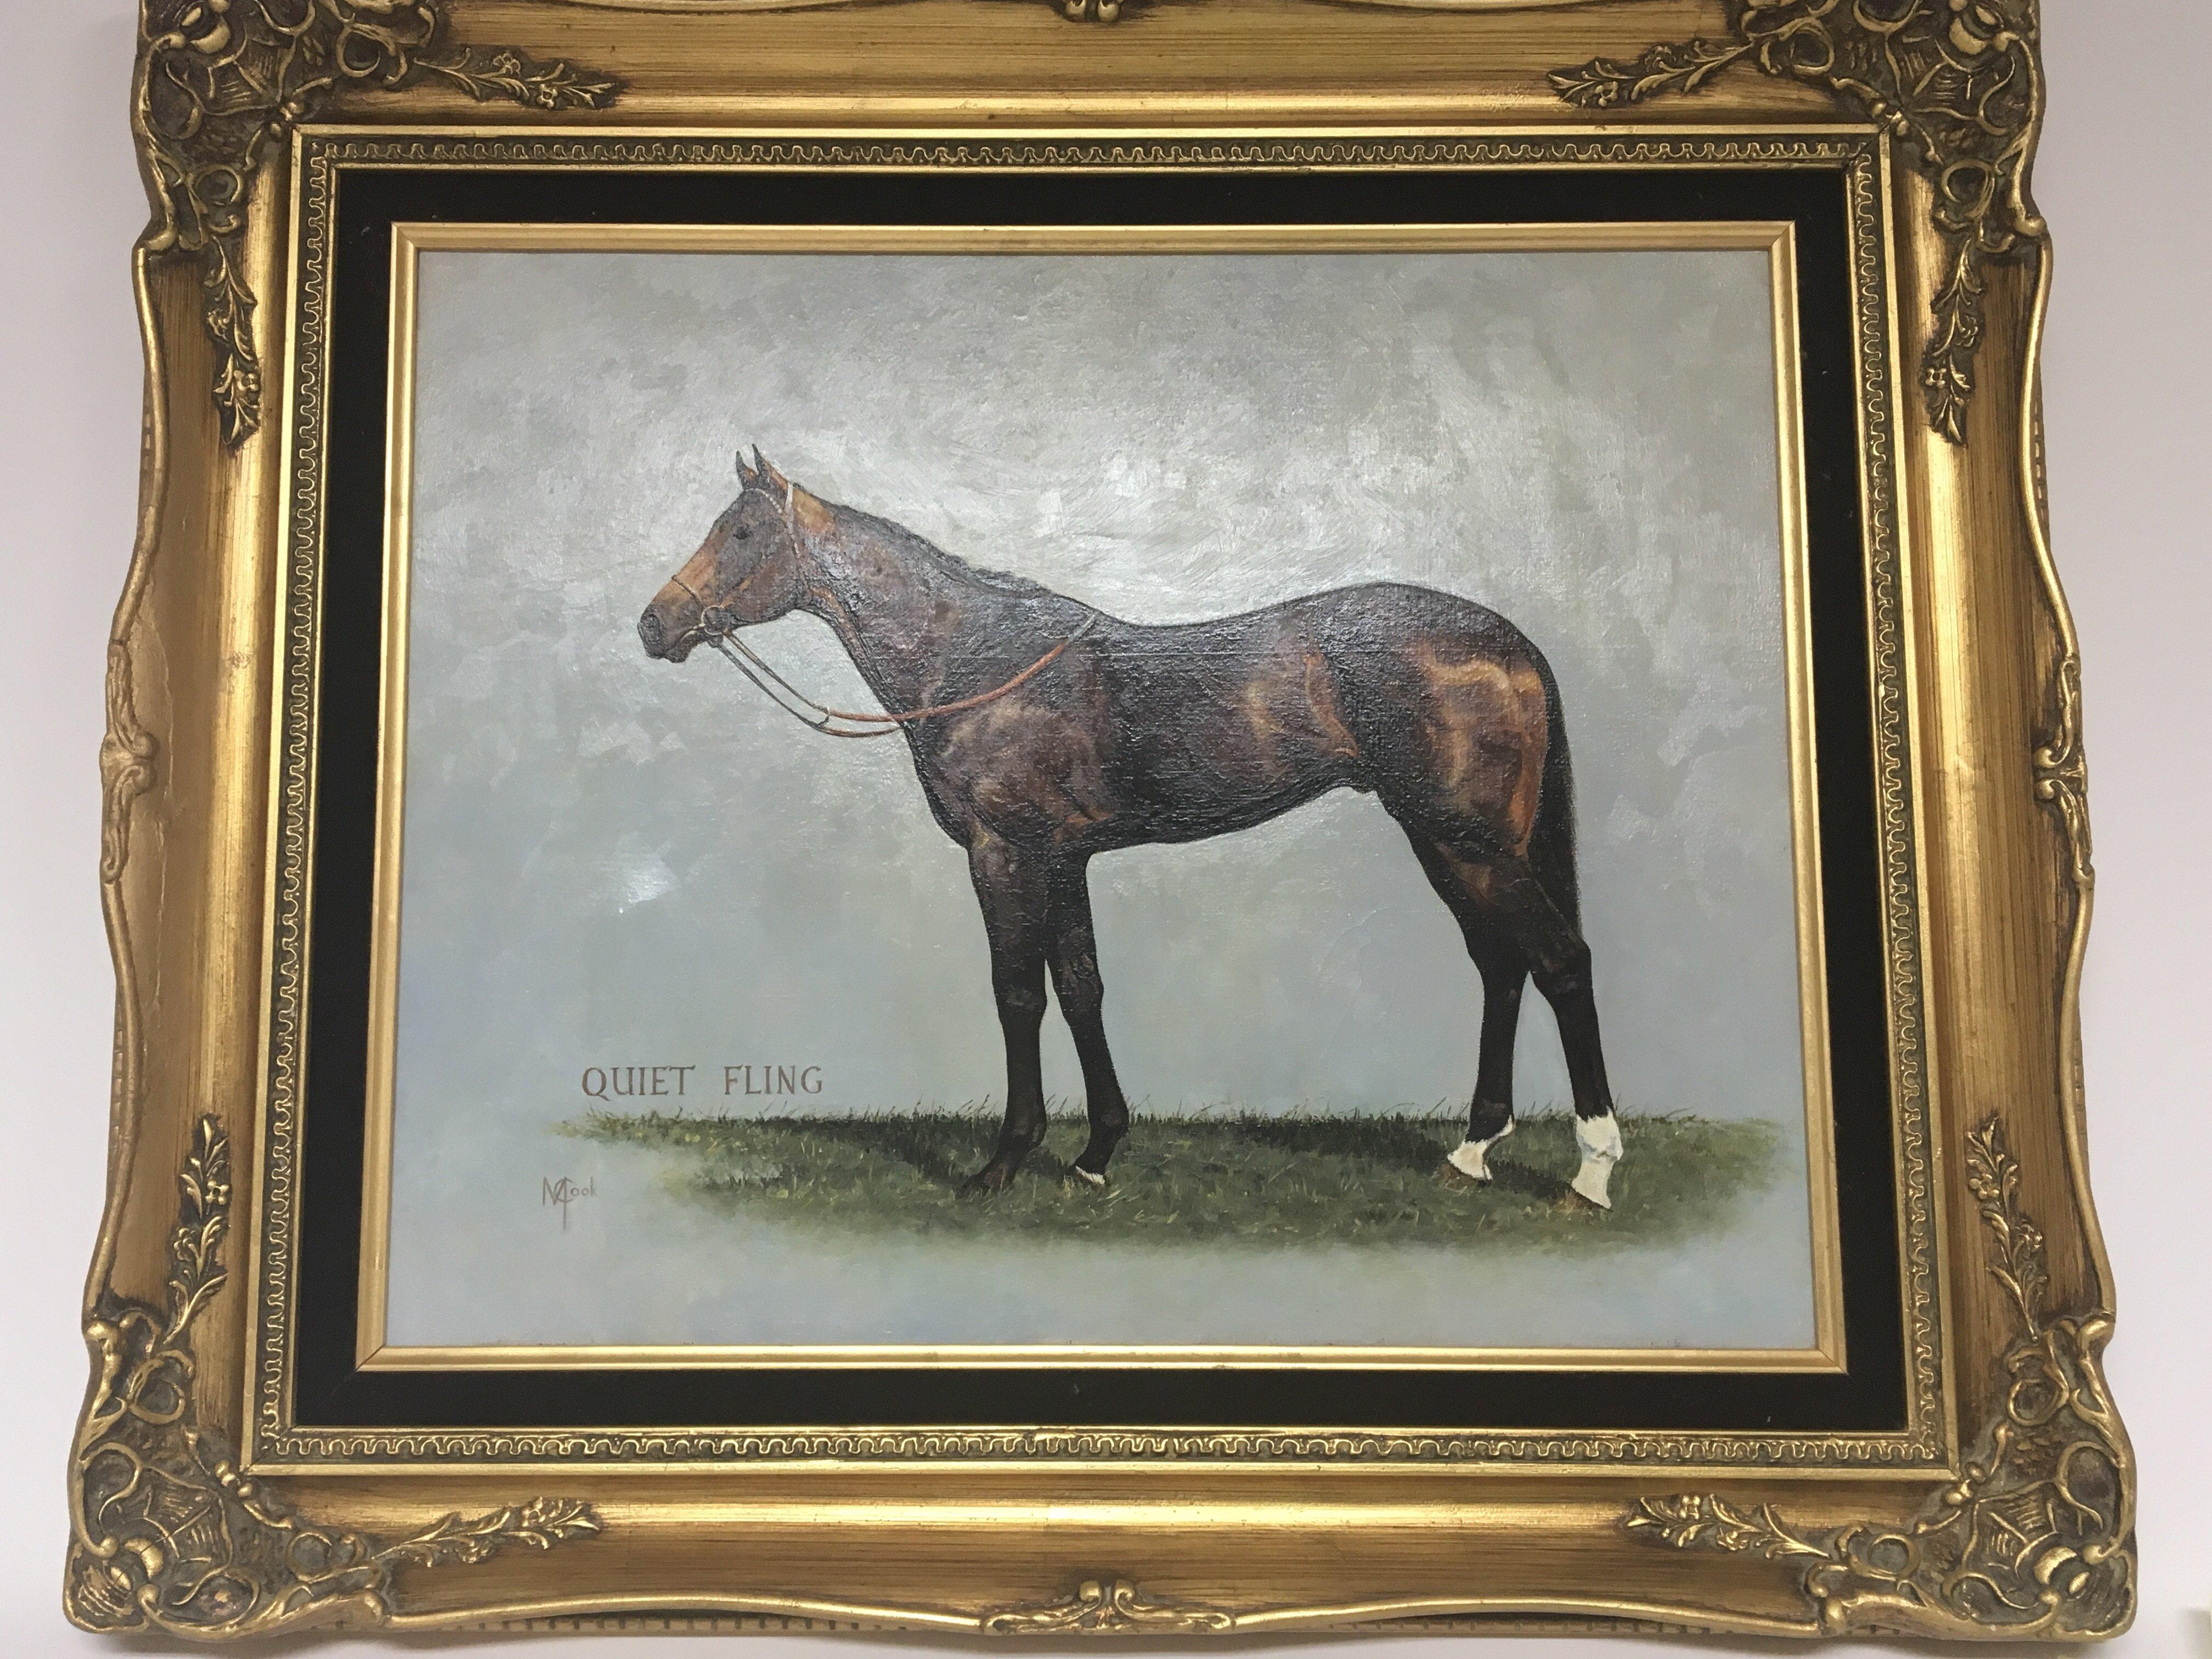 Lot 1222 - A gilt Framed oil painting on canvas. The Racehors